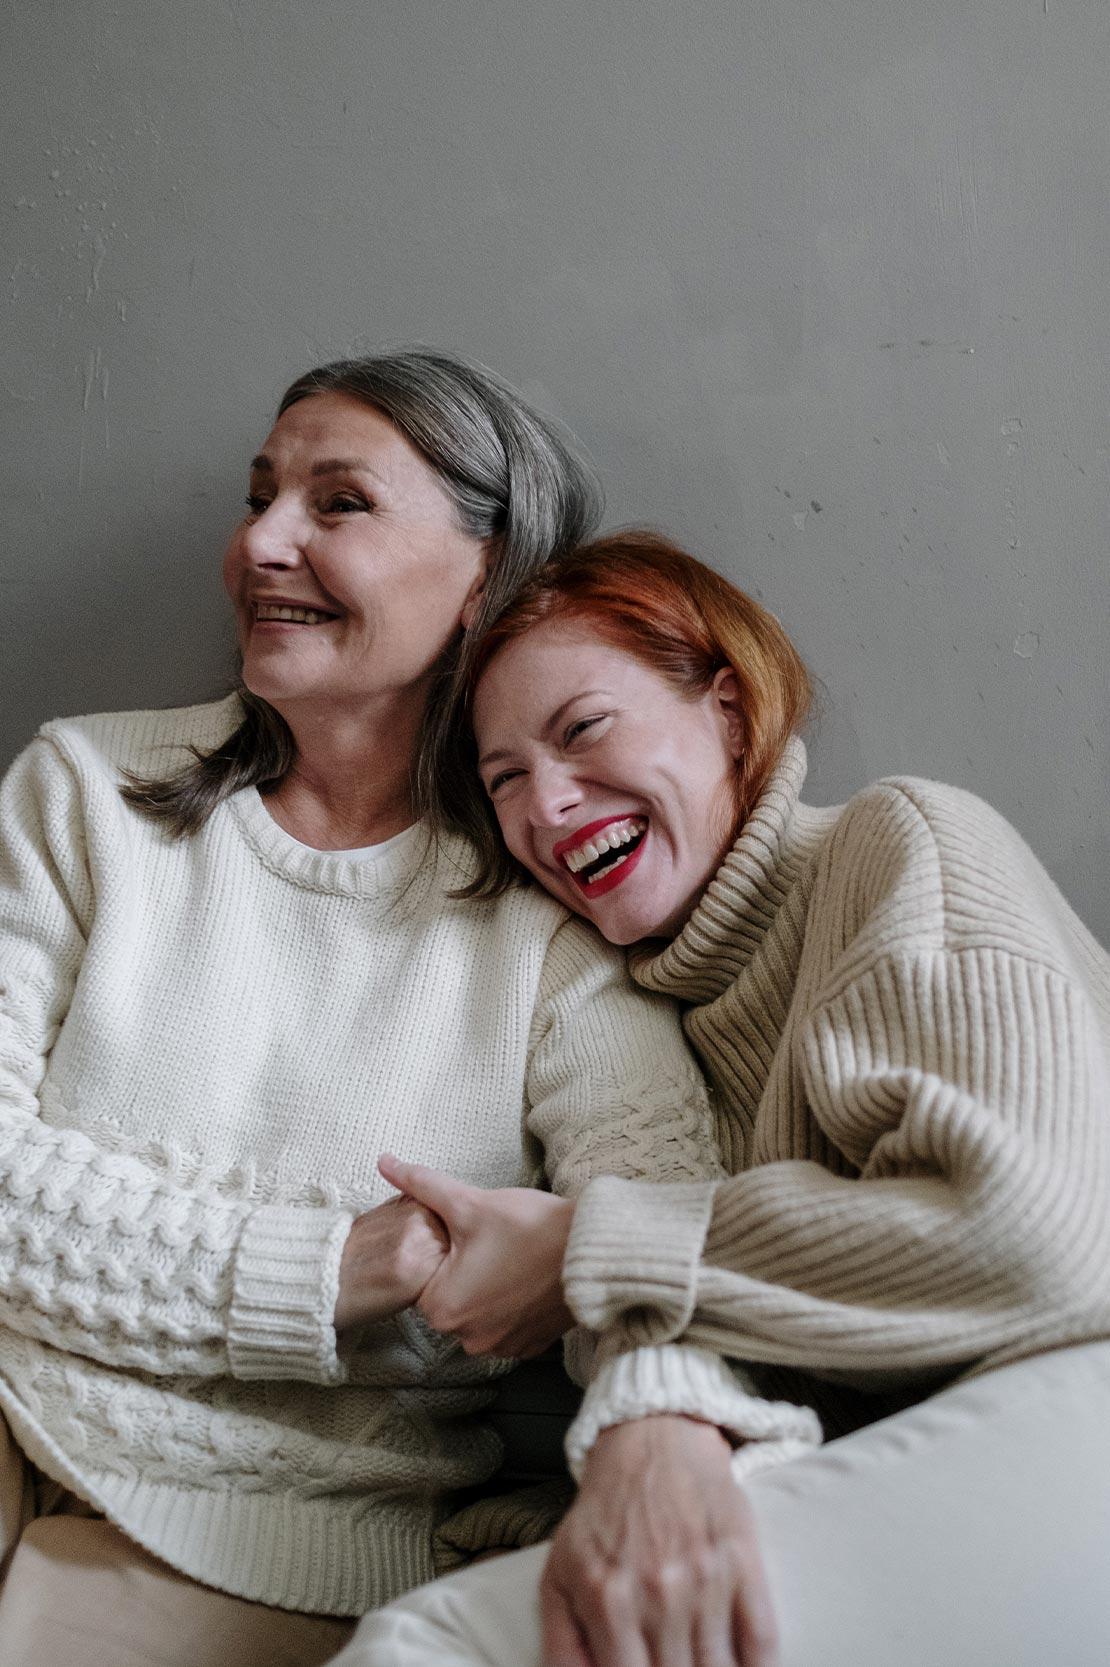 Two-women-1-x2500w